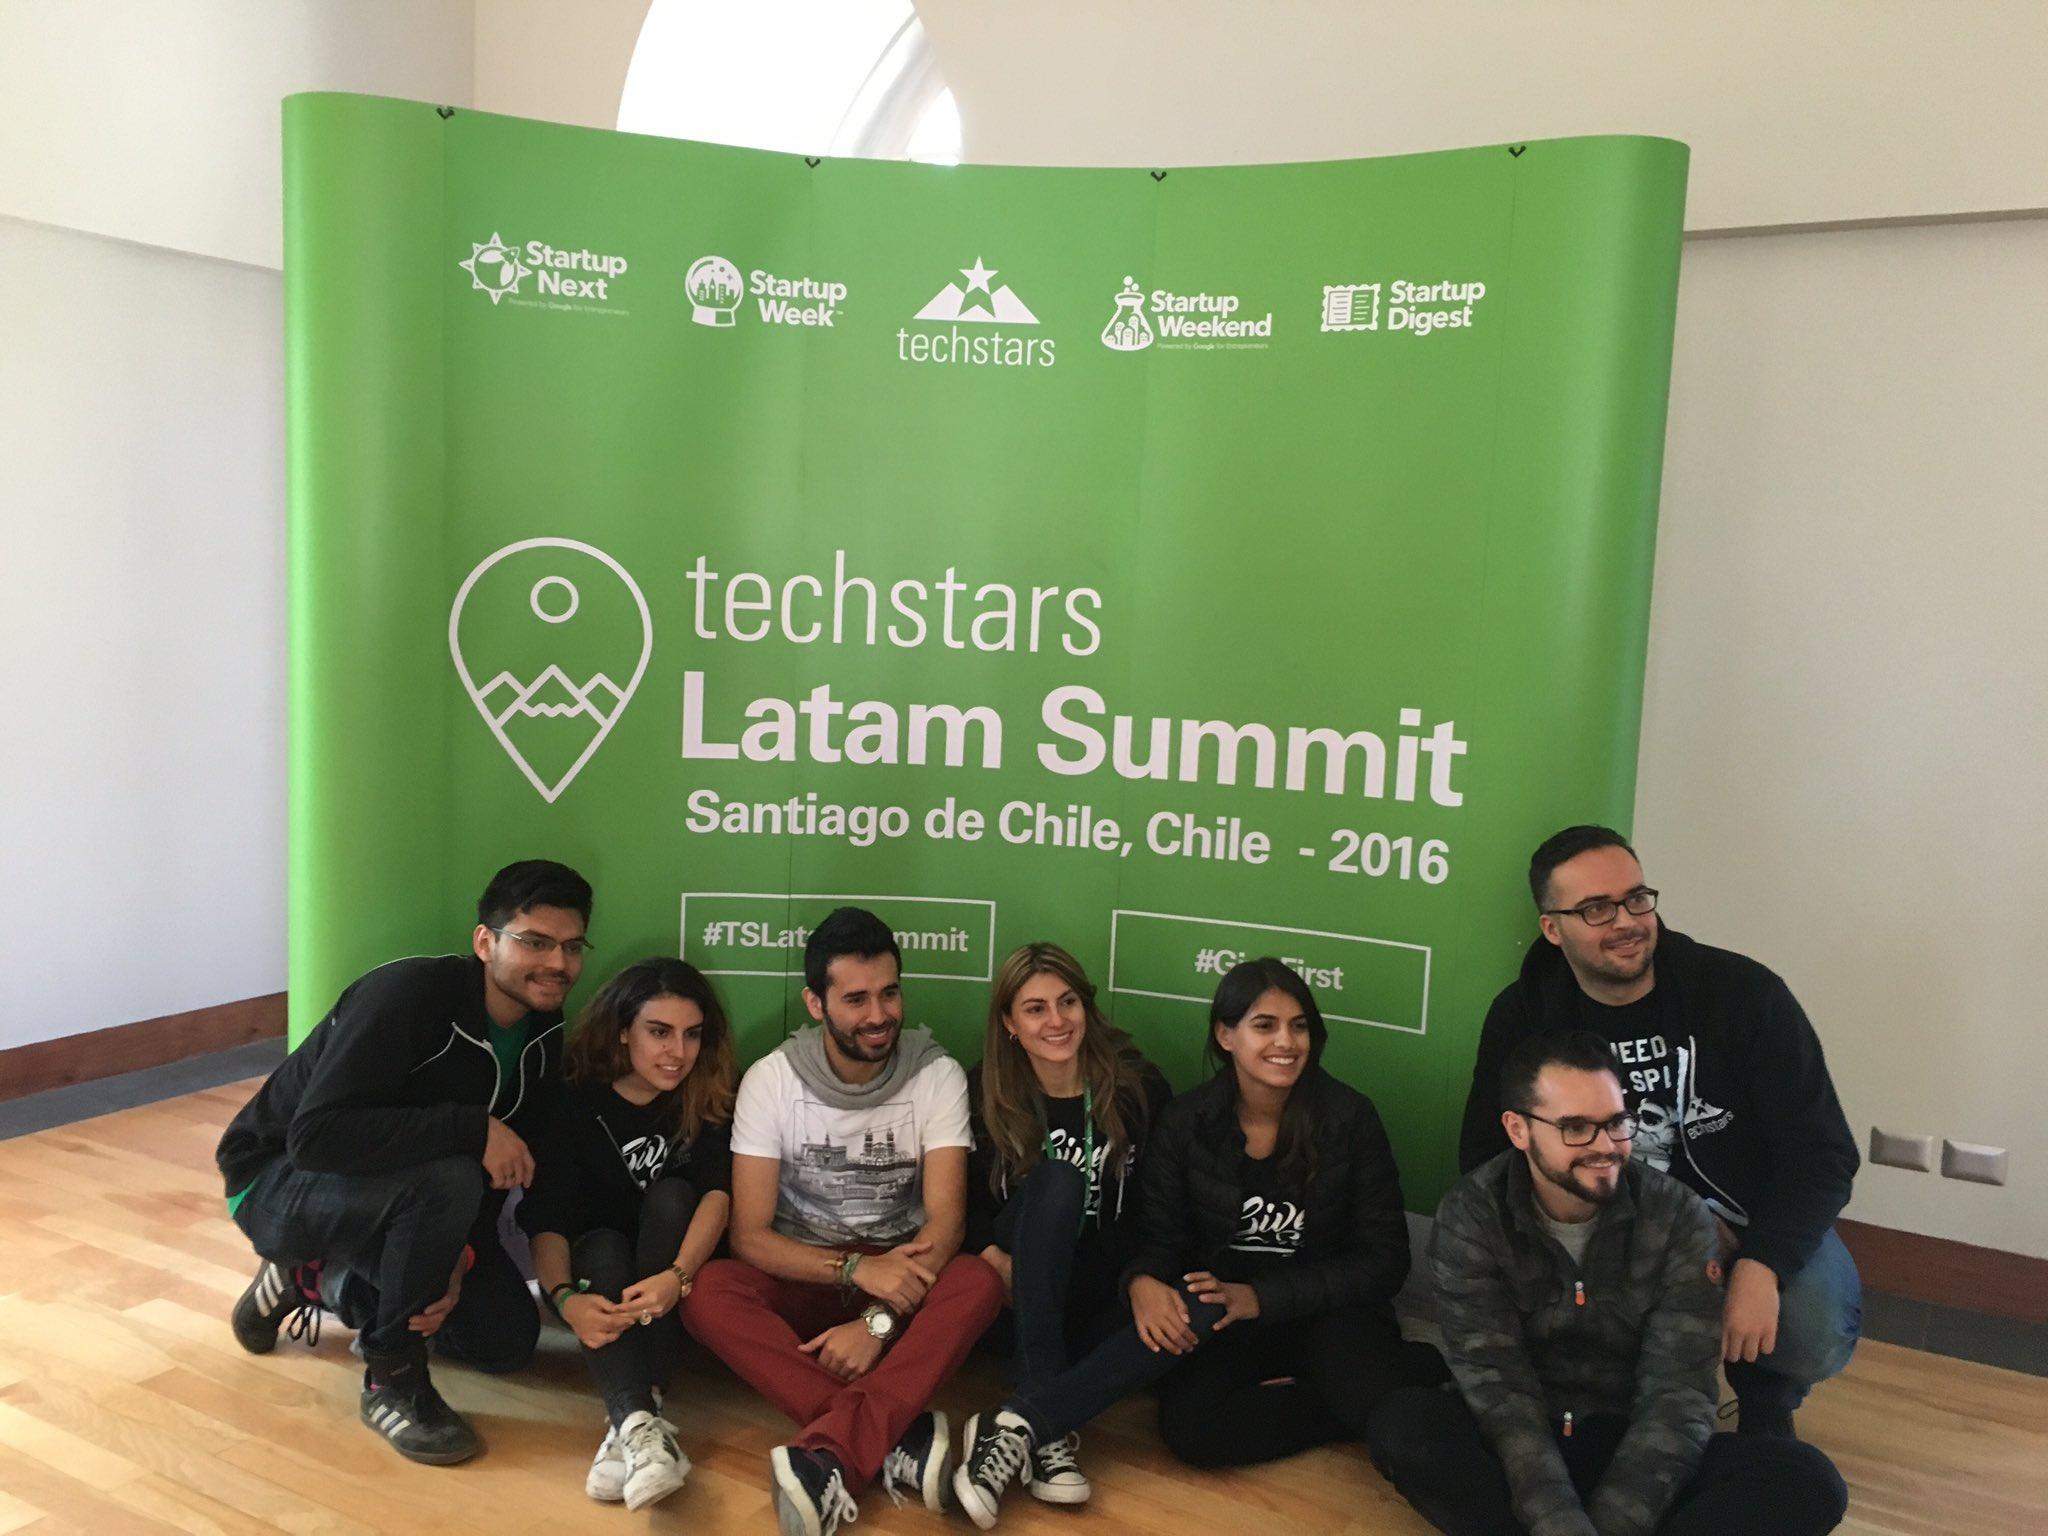 Felicidades al dream team de @techstars Latam que sigan los éxitos #TSLatamSummit https://t.co/Xjvw9Fvnm6